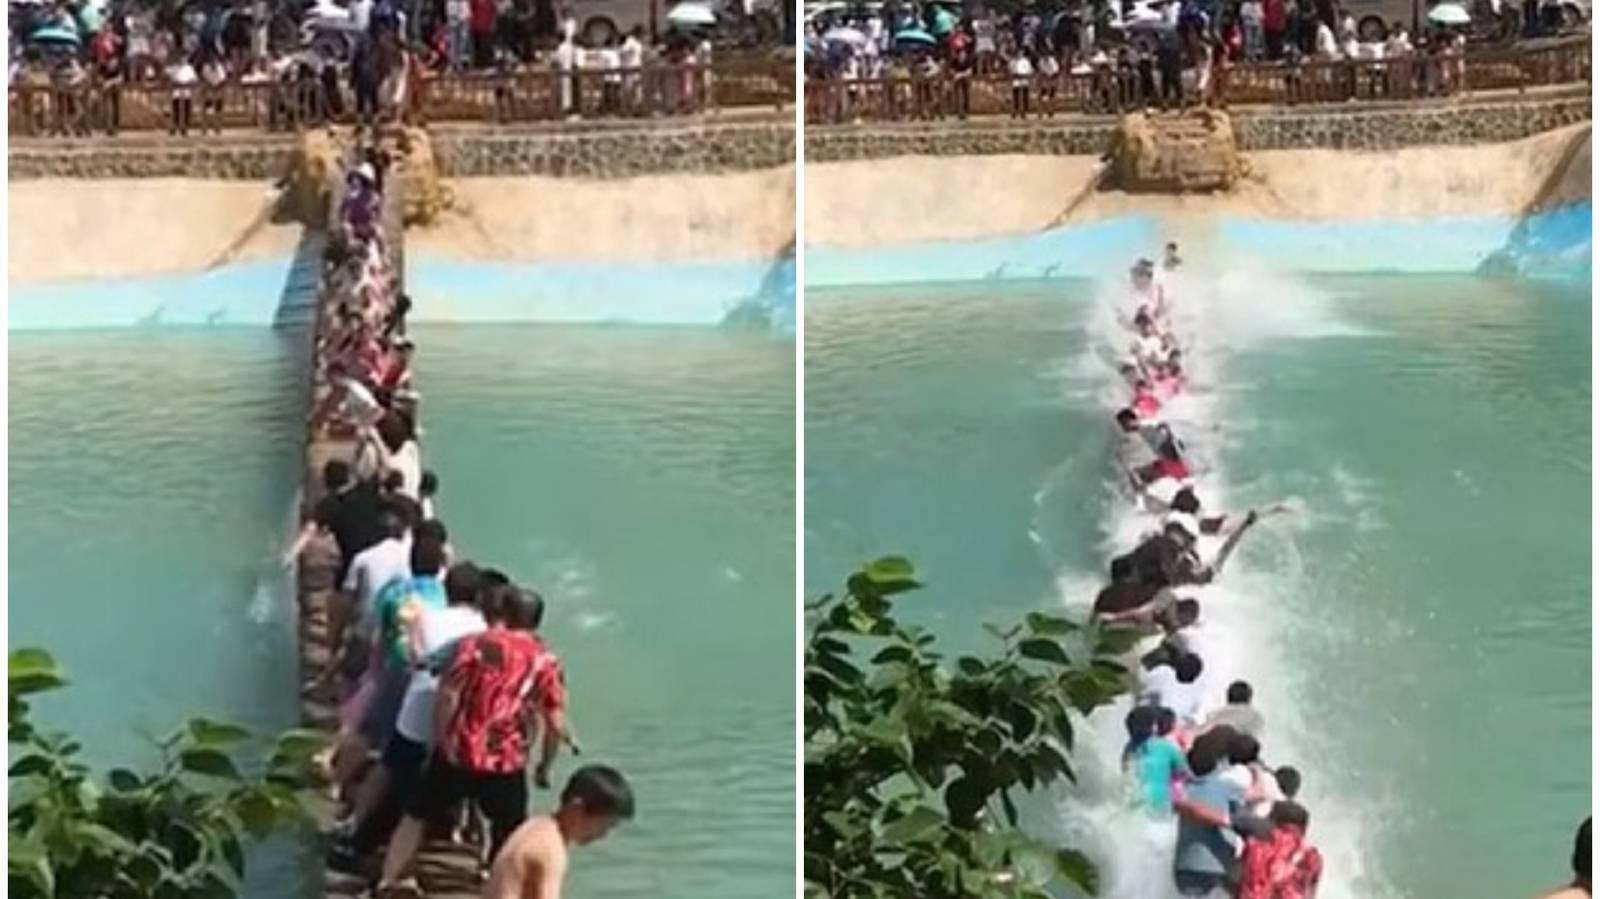 Swinging bridge breaks plunging tourists into lake in China